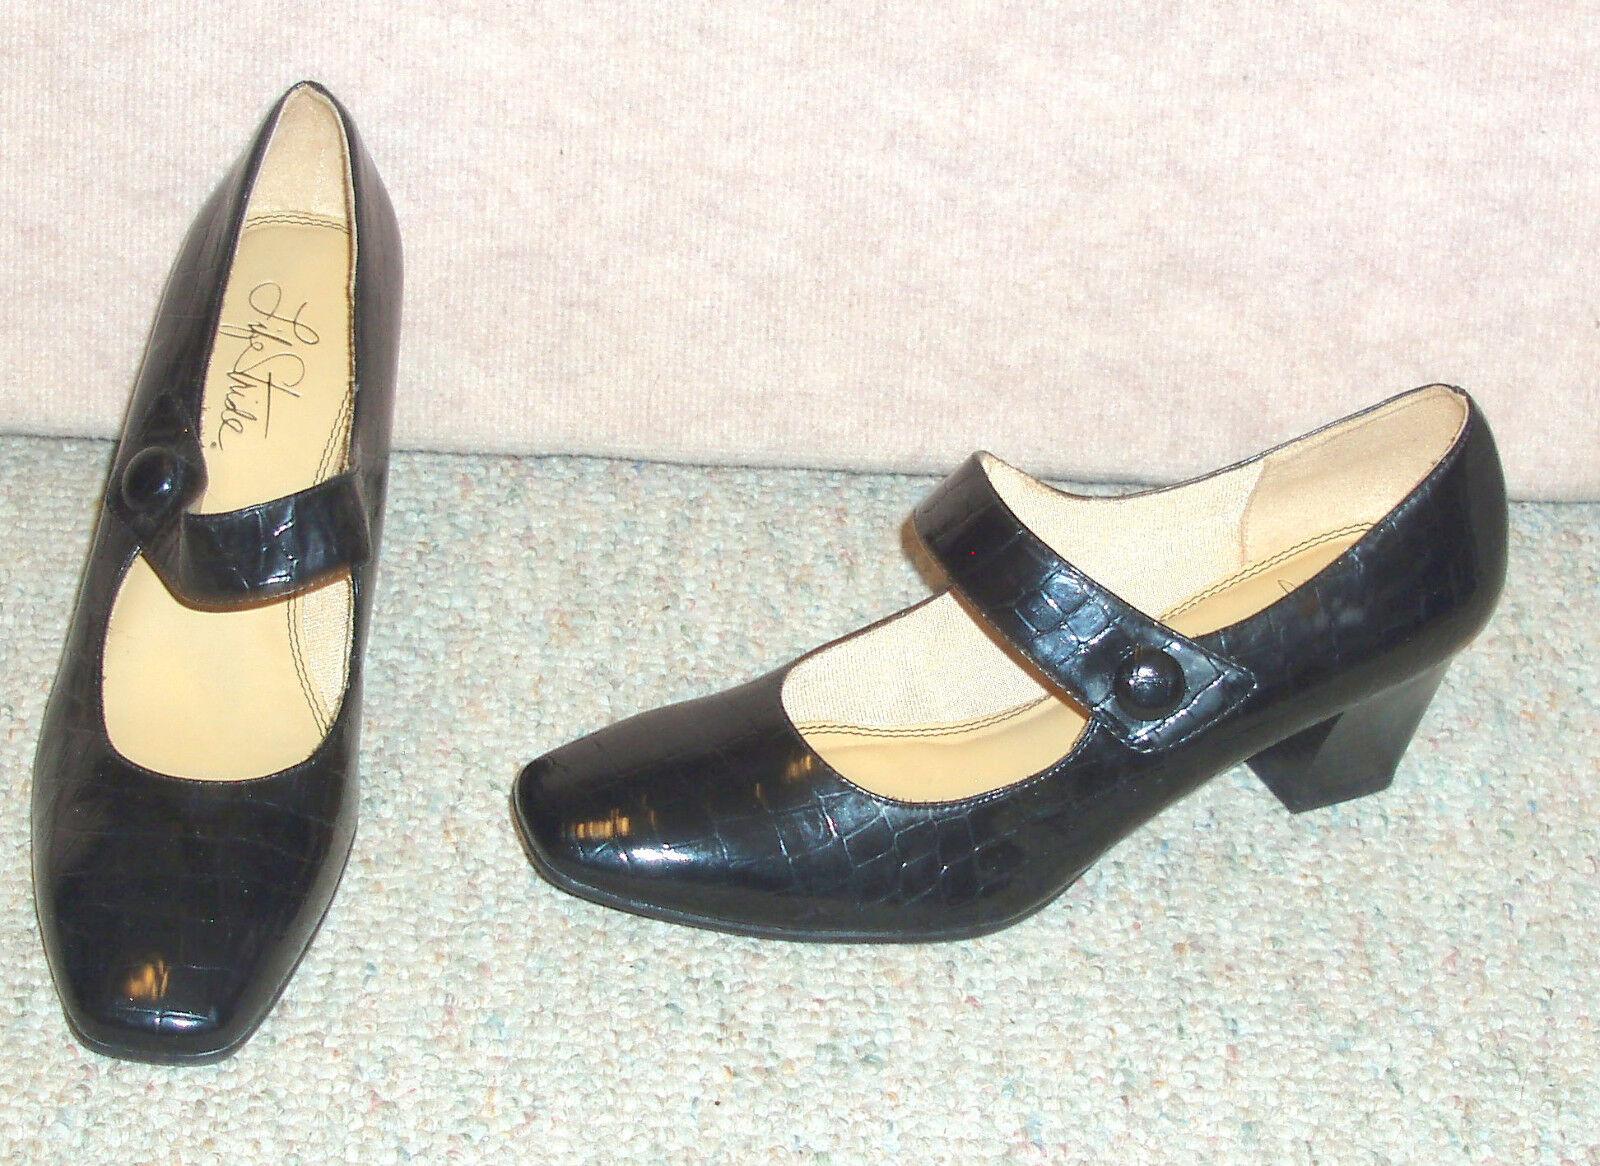 Women's black LIFE STRIDE Sindy Mary Janes   pumps / shoes  Janes / heels , sz 10 M 38045e